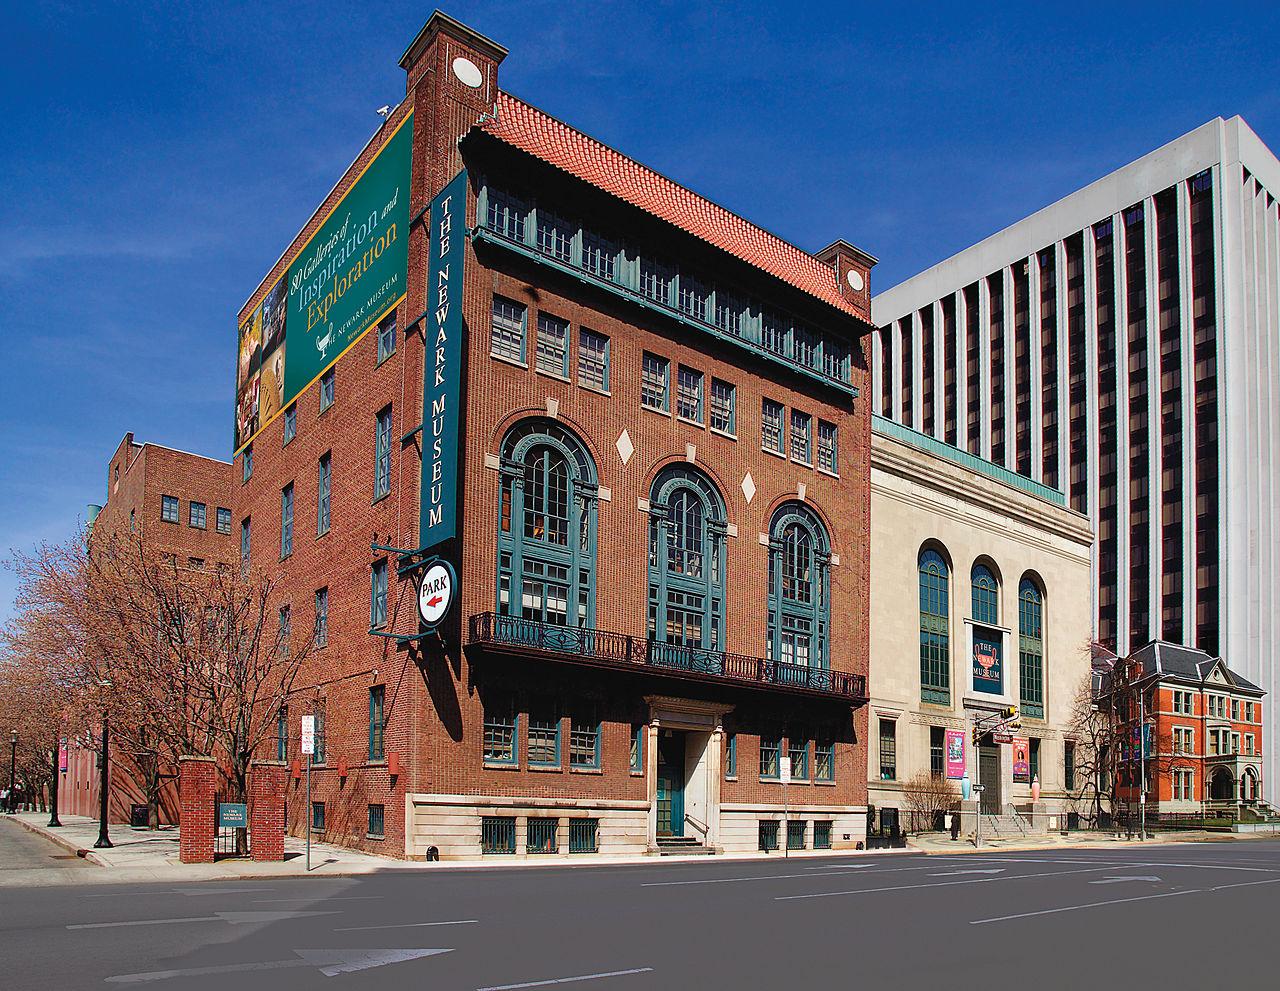 Popular Art Museum in New Jersey-The Newark Museum of Art